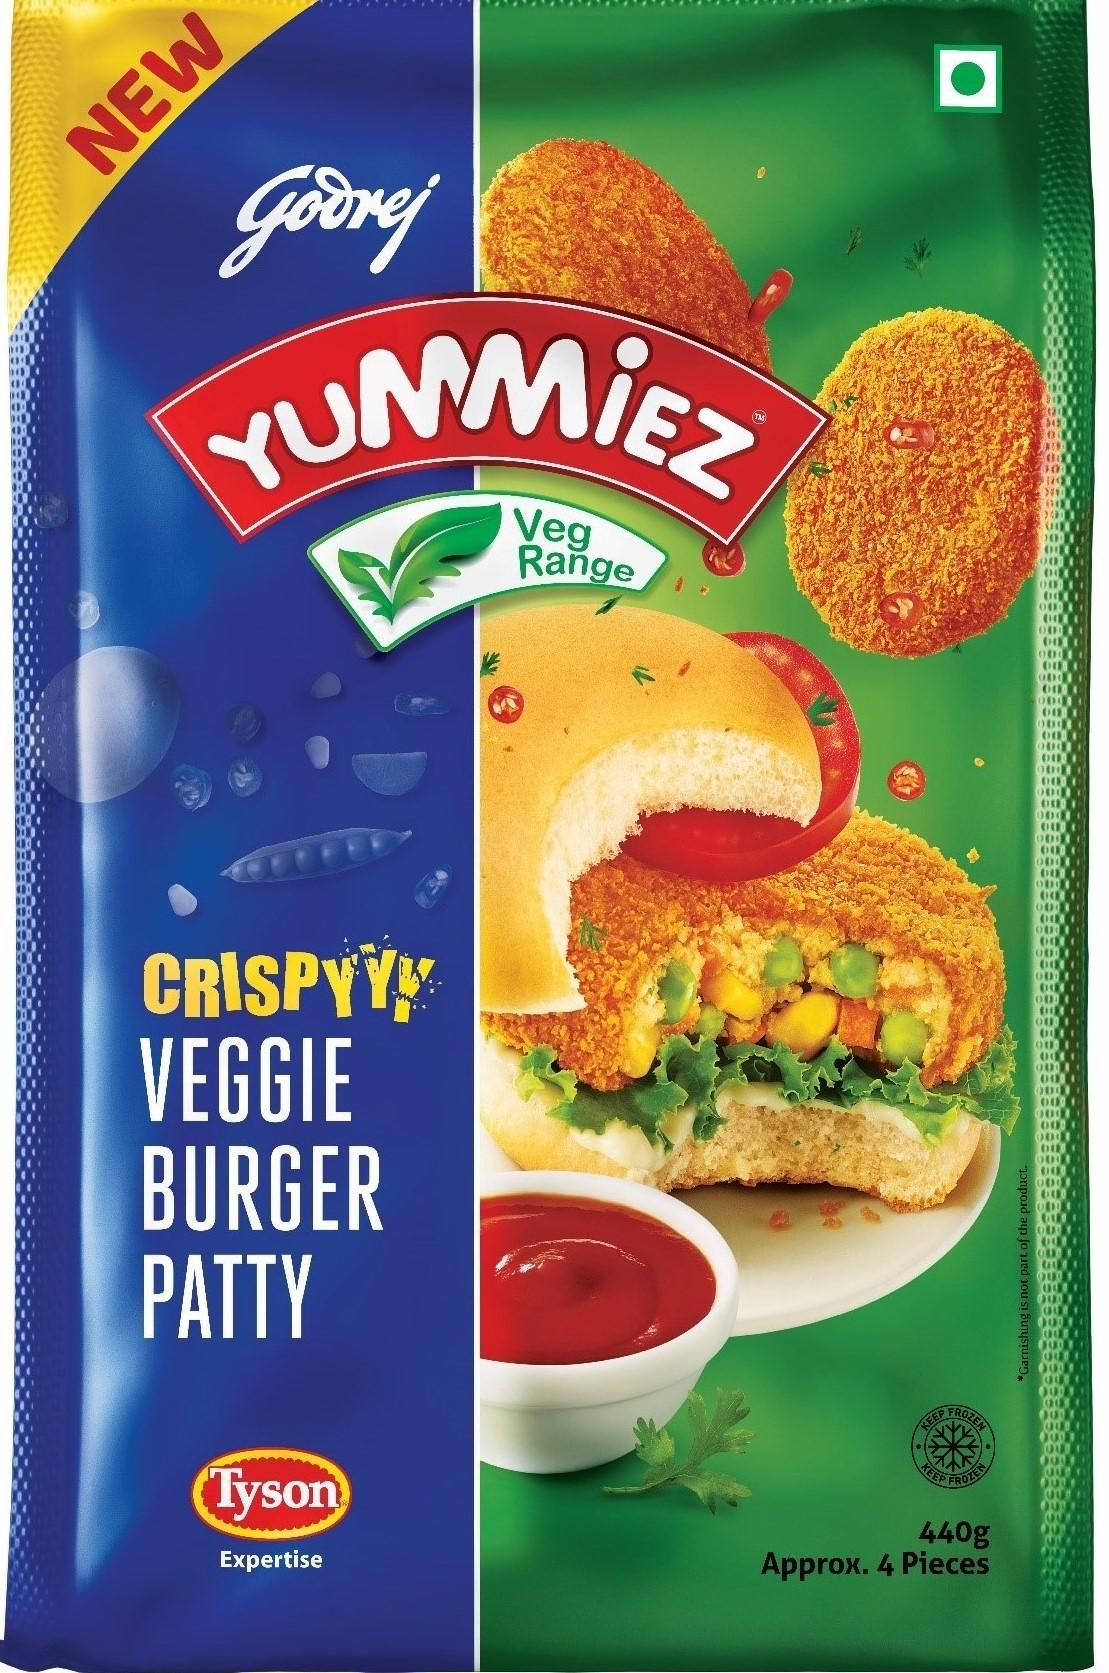 Yummiez Crispy Veggie Burger Patty 440g